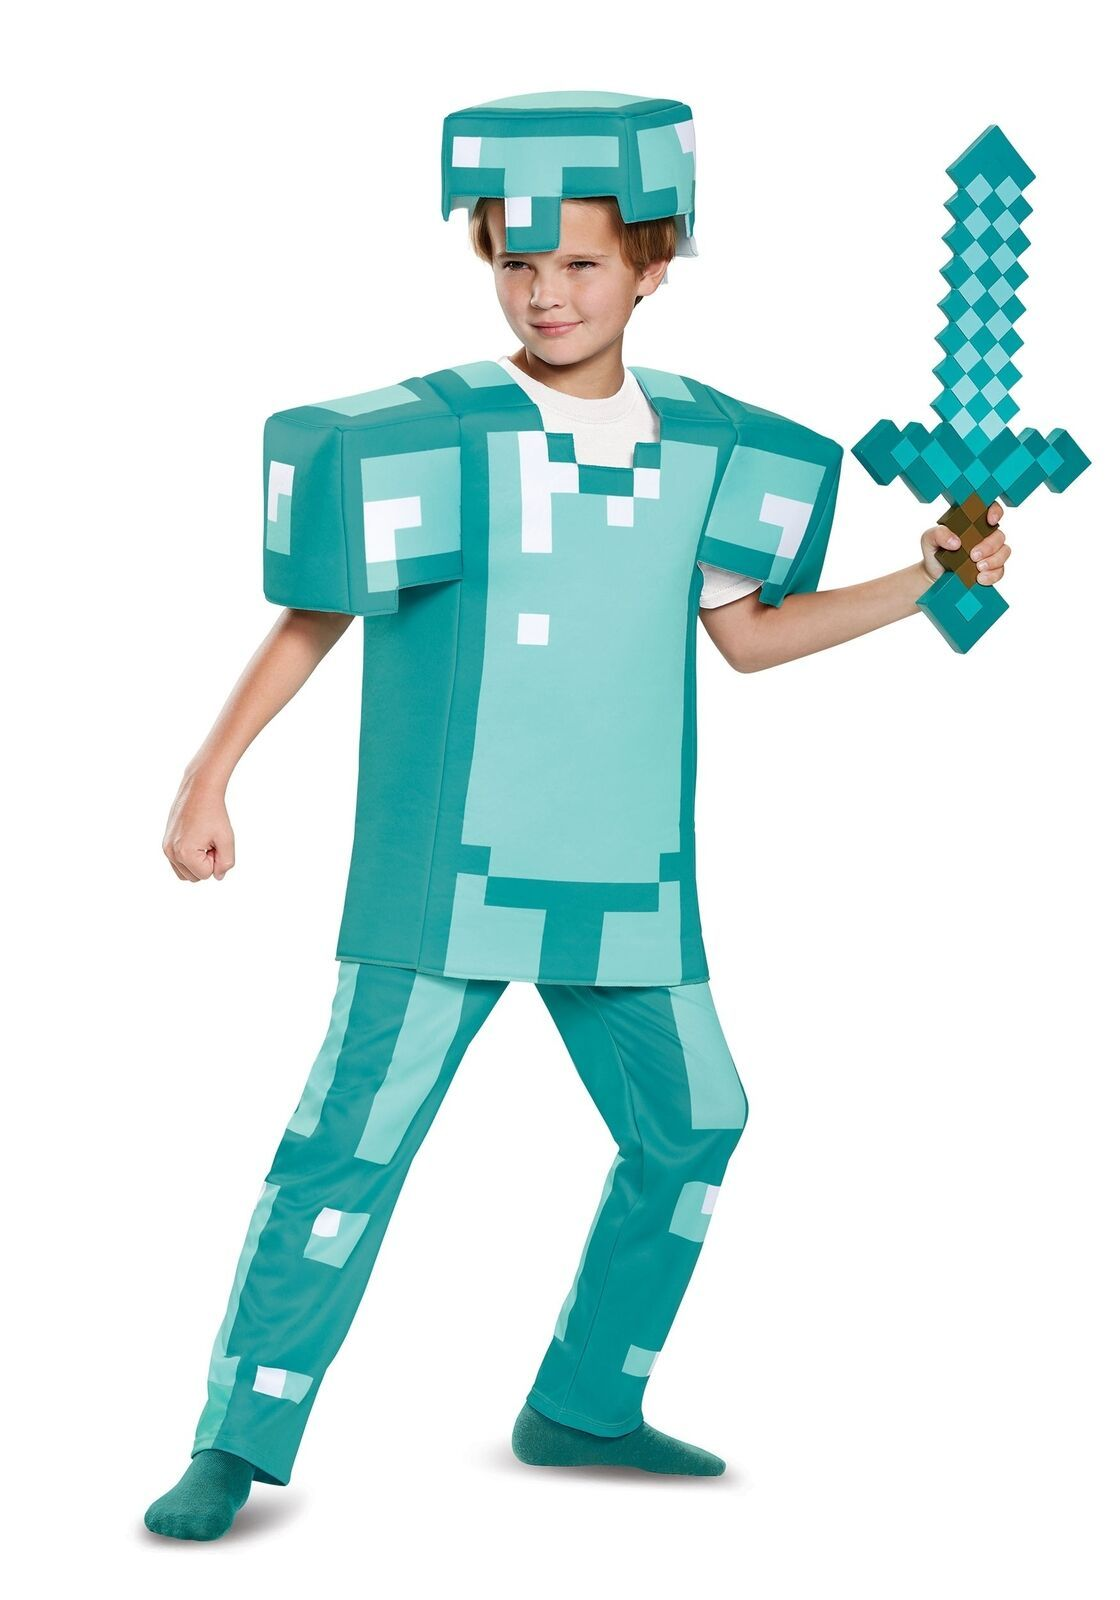 Minecraft Halloween Costumes For Kids 2020 Boys Minecraft diamond armor costume in 2020 | Minecraft costumes